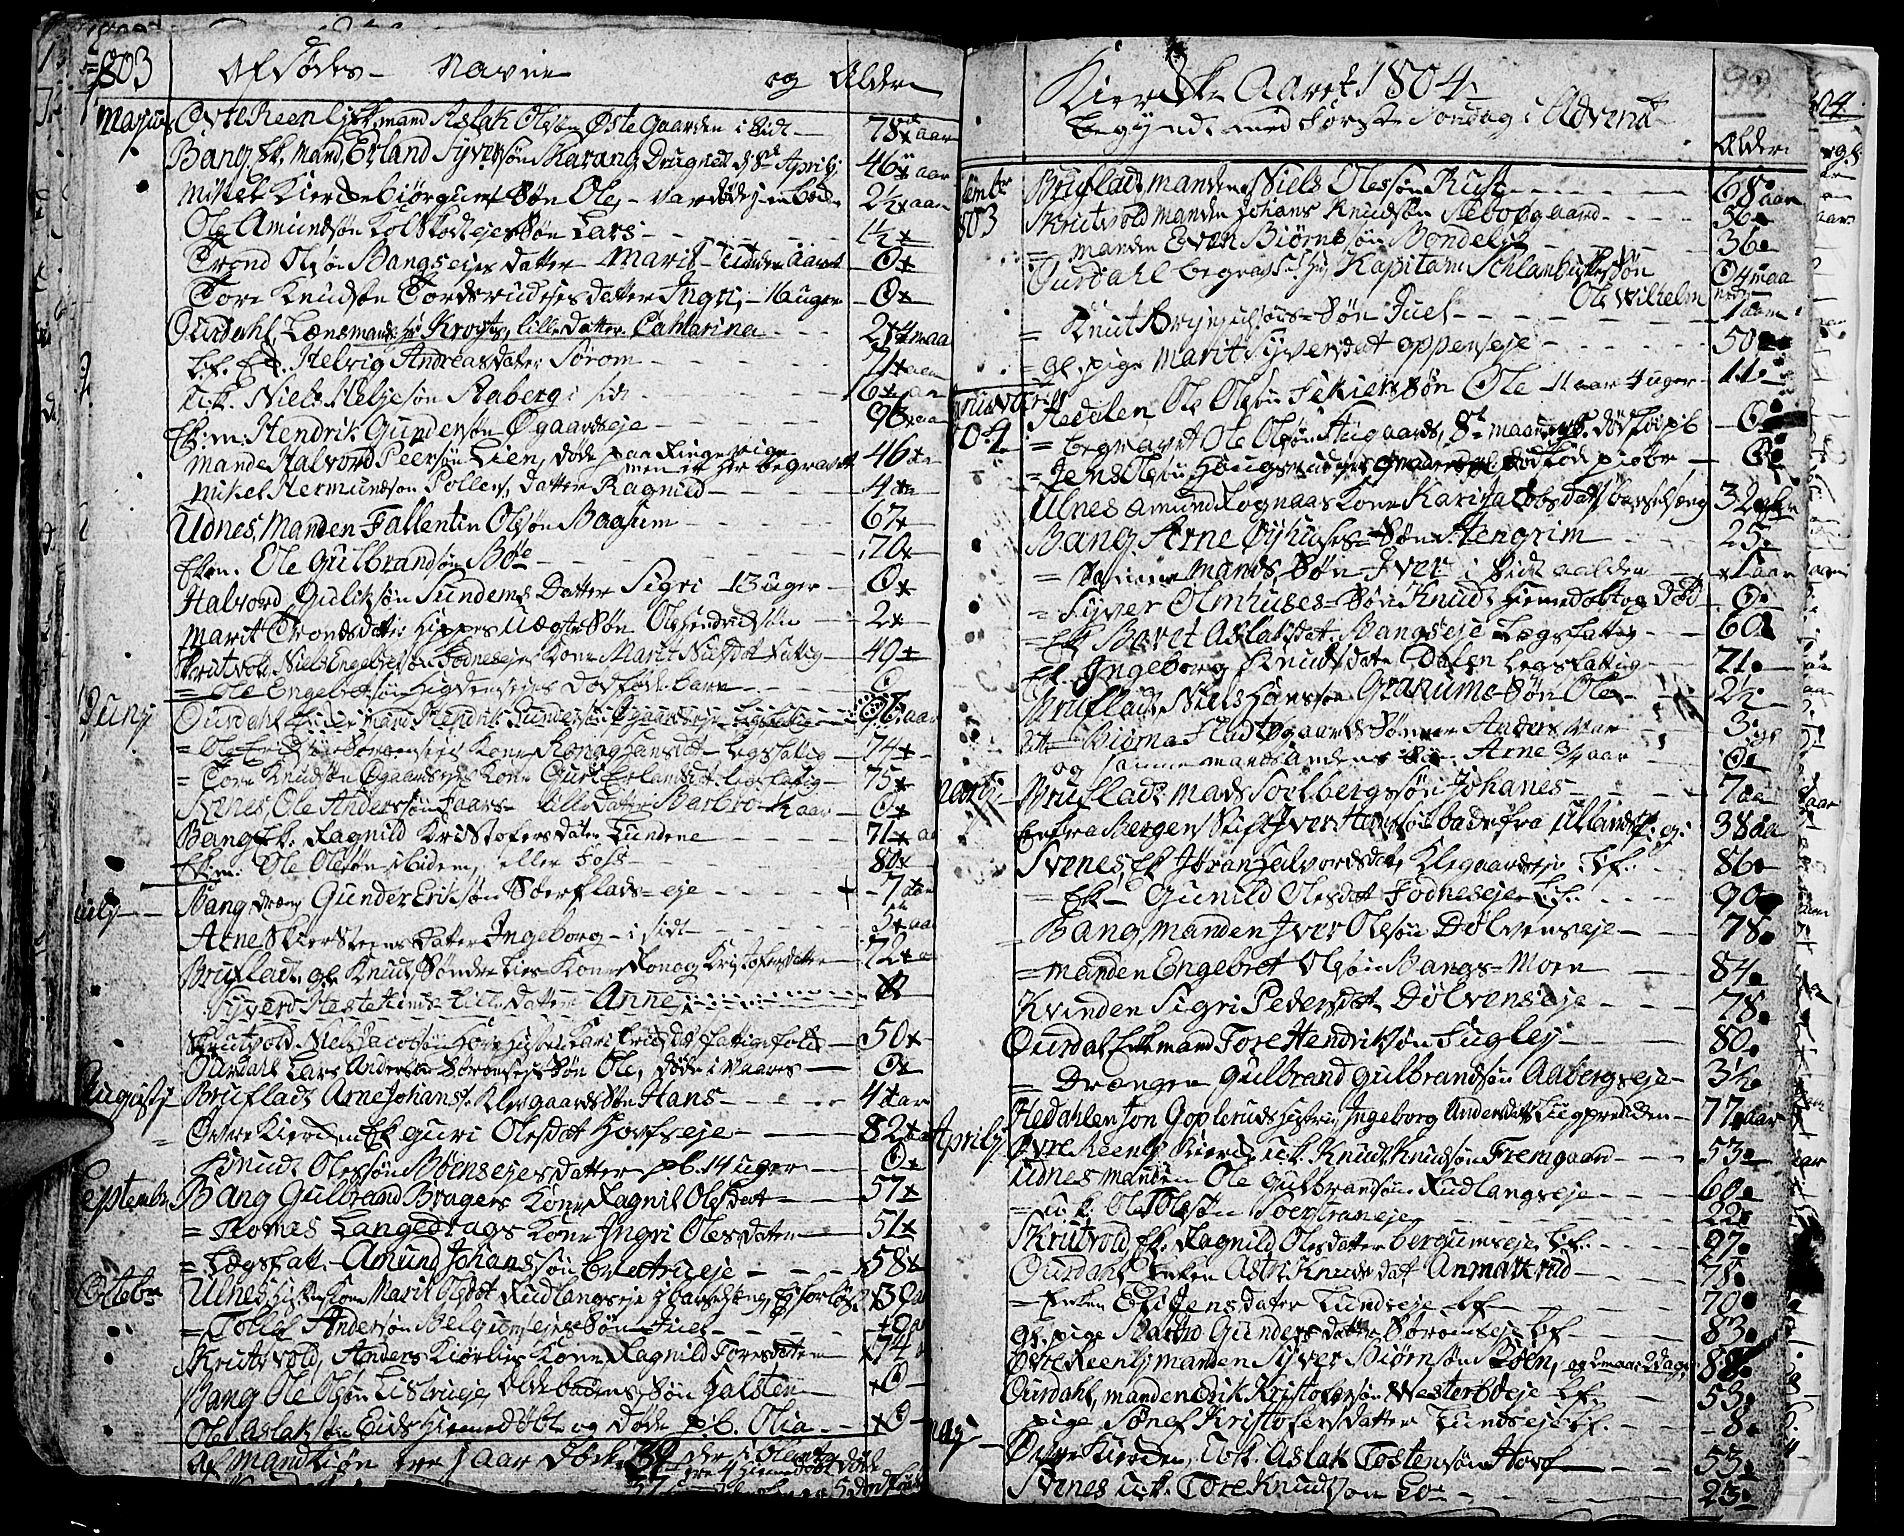 SAH, Aurdal prestekontor, Ministerialbok nr. 7, 1800-1808, s. 99